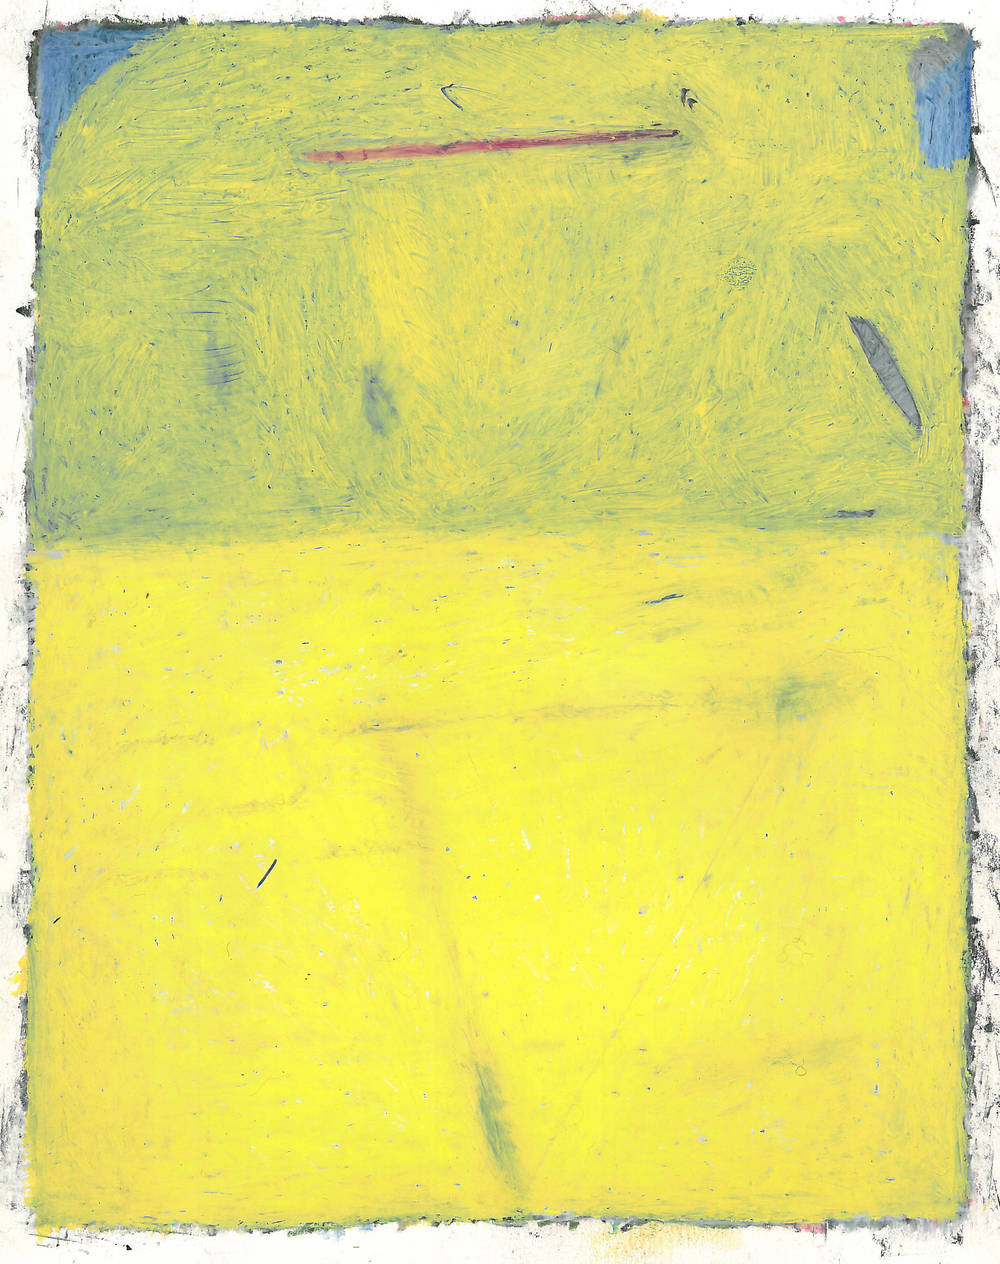 "Oil Pastel - 8.5"" x 11"" - 1999"